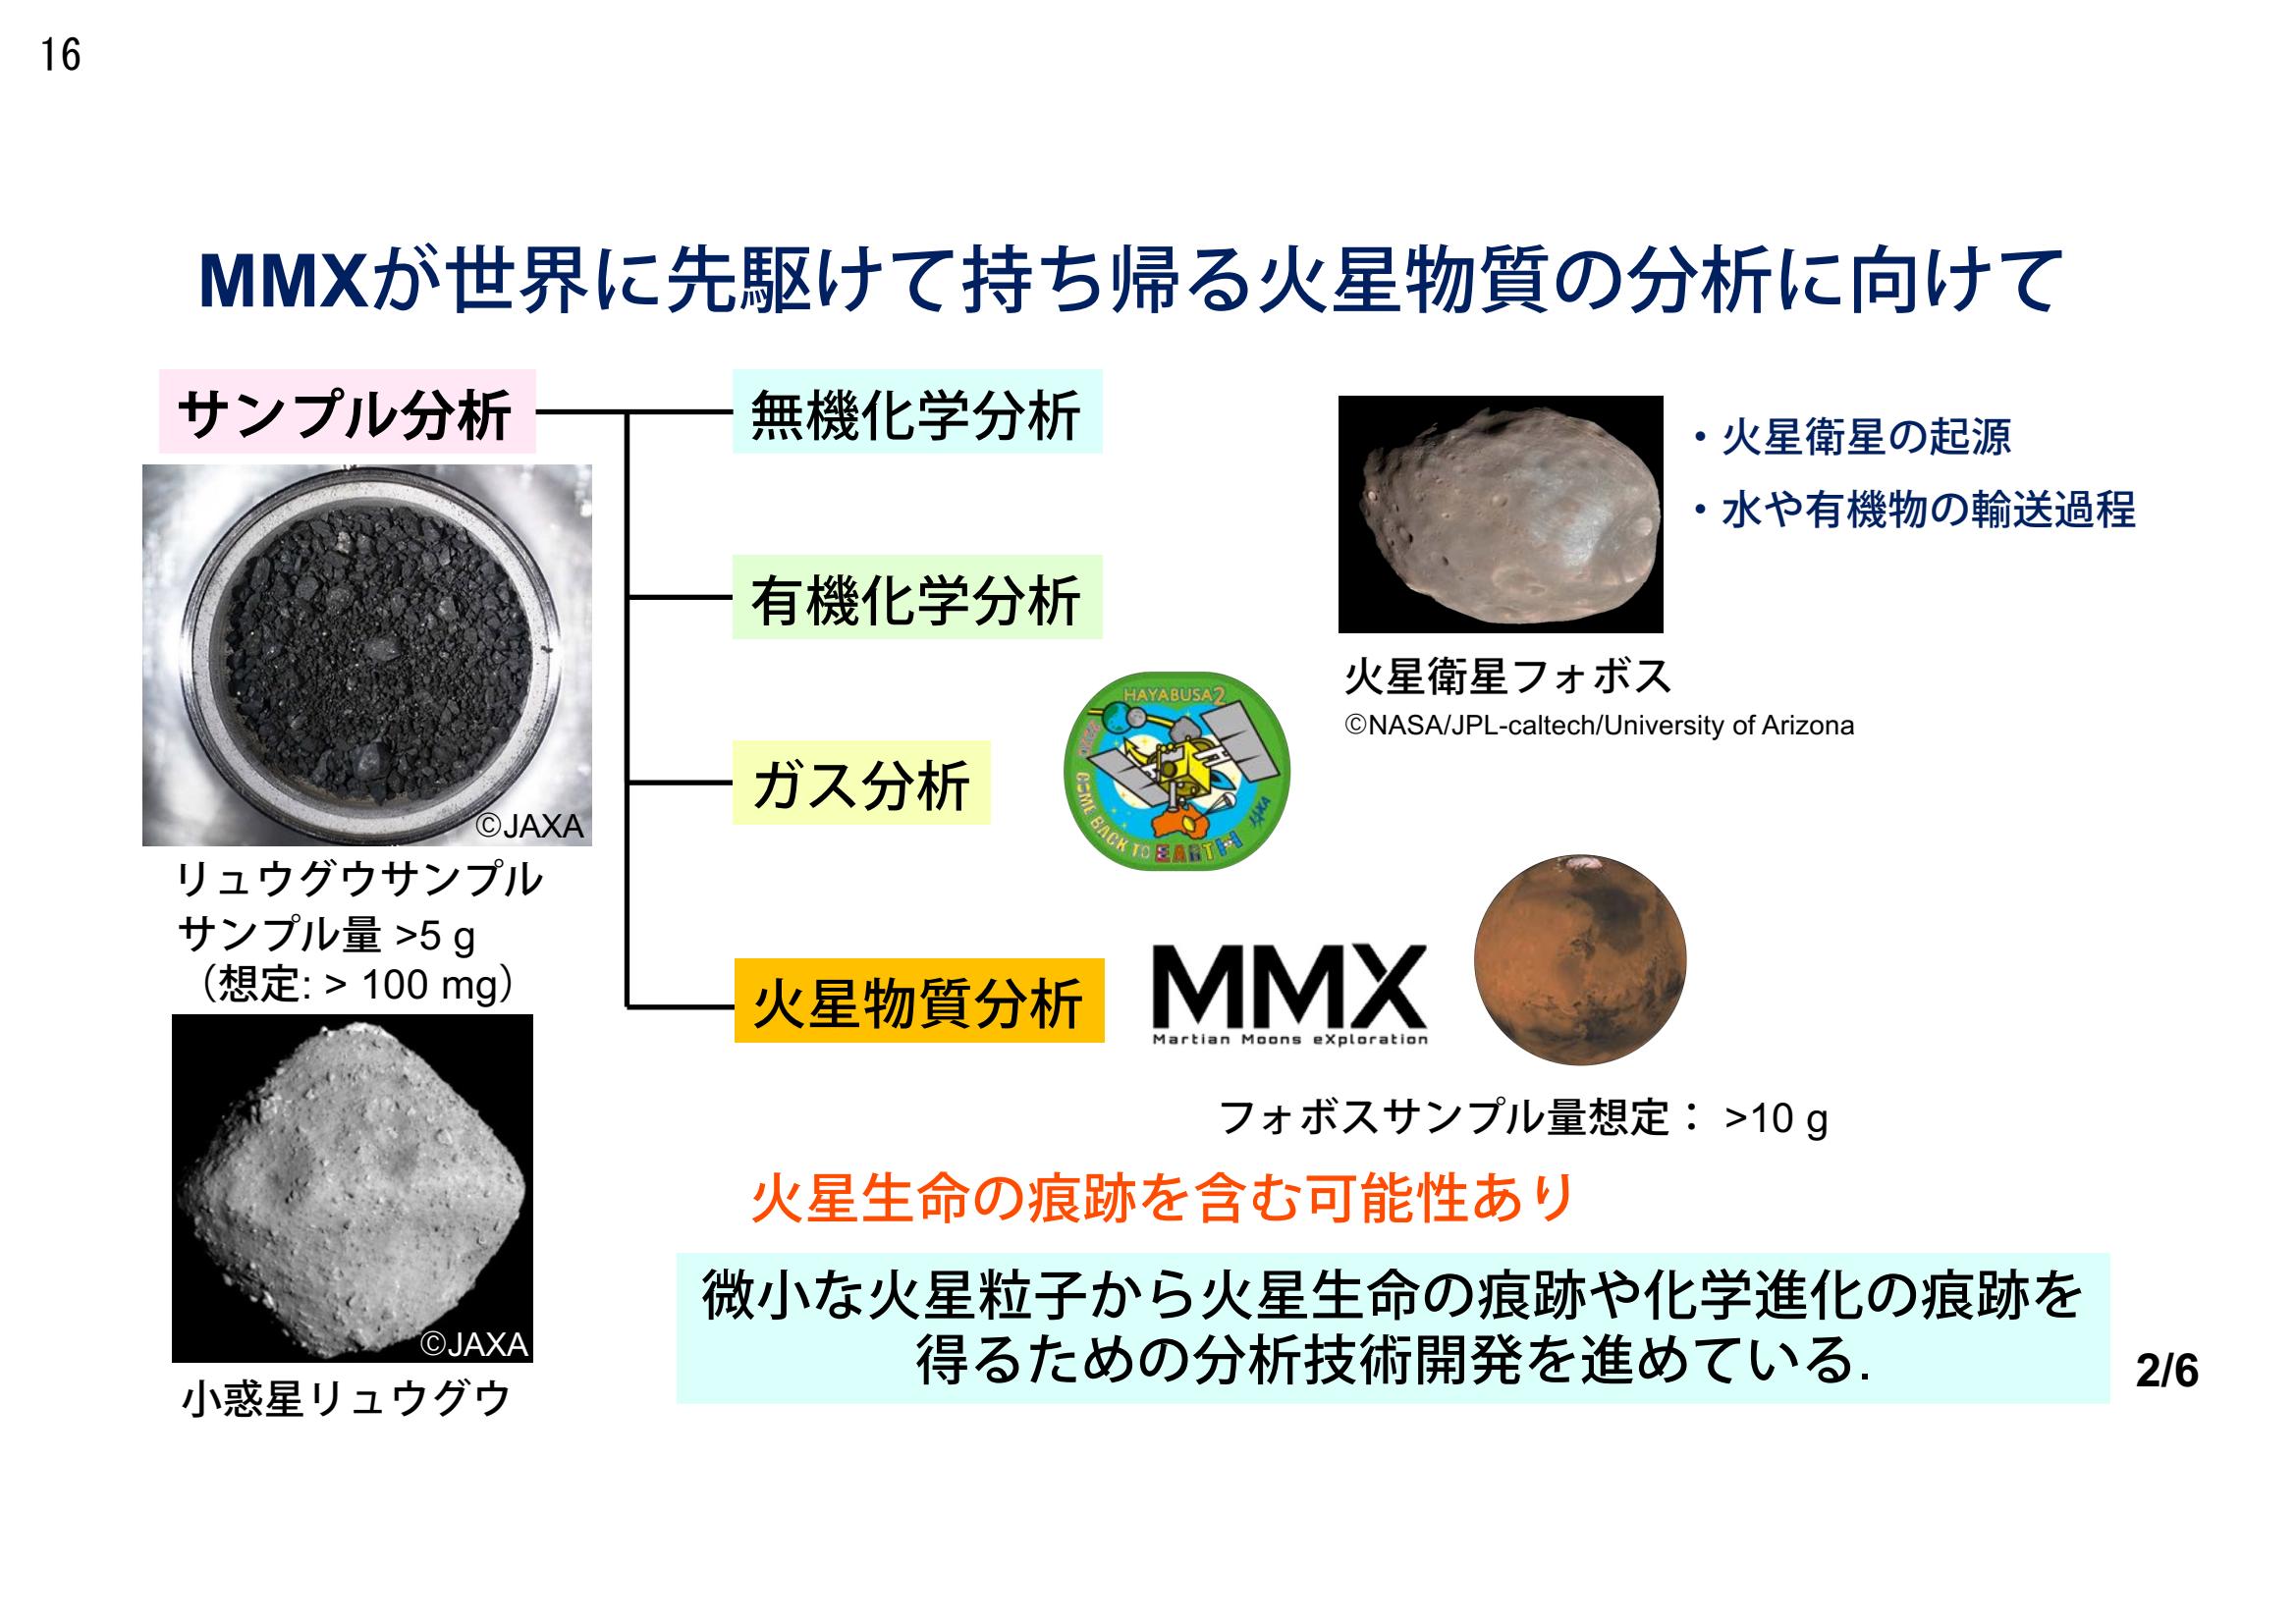 f:id:Imamura:20210819095559p:plain